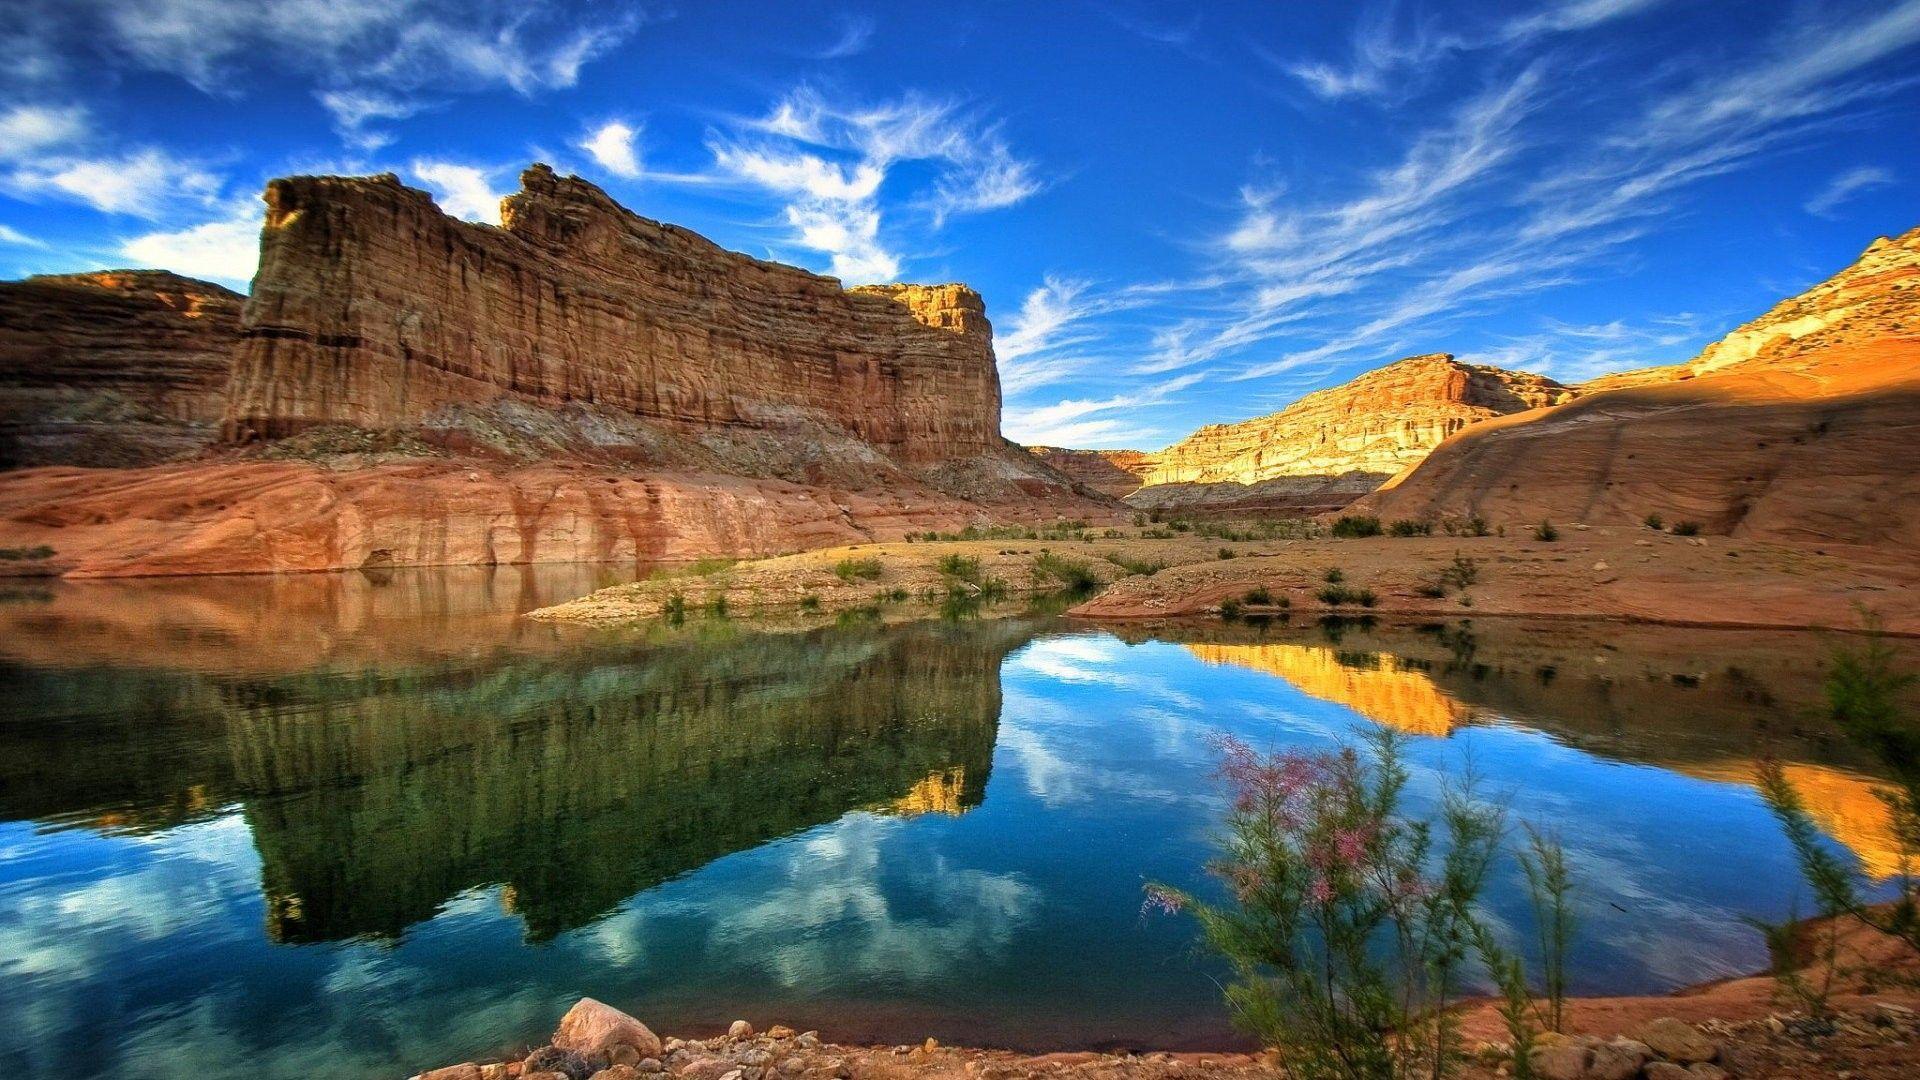 Hd Landscape Wallpapers Top Free Hd Landscape Backgrounds Wallpaperaccess